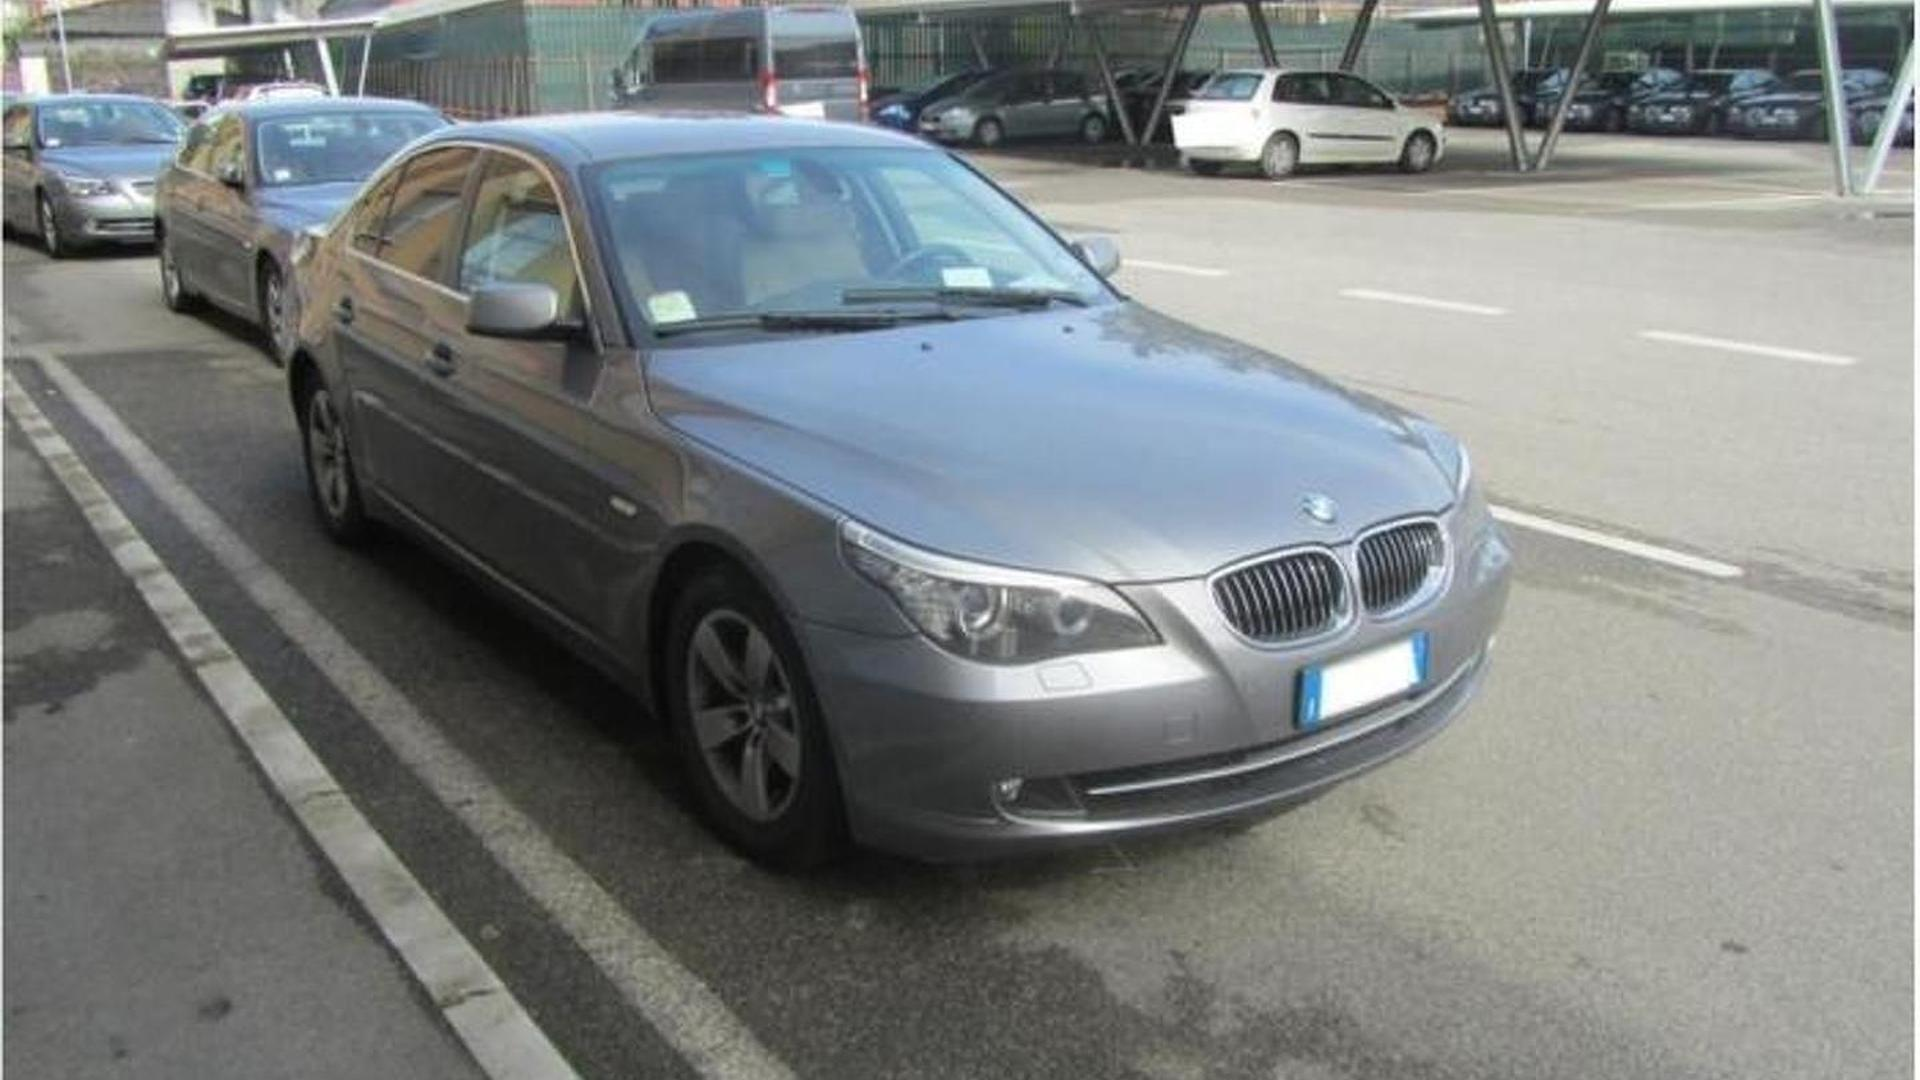 Italian government sells 151 non-essential executive cars